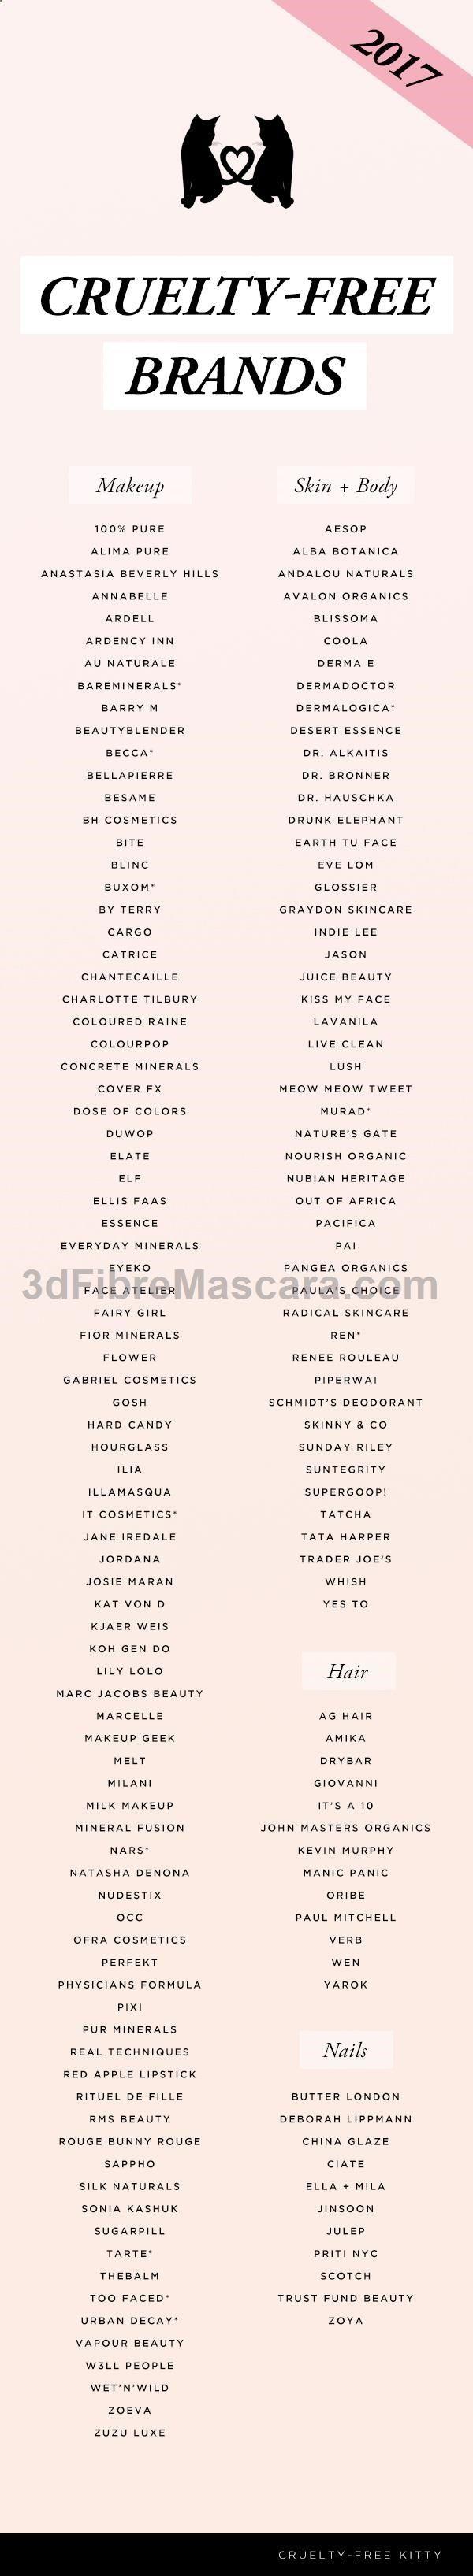 Cruelty Free Beauty Brands